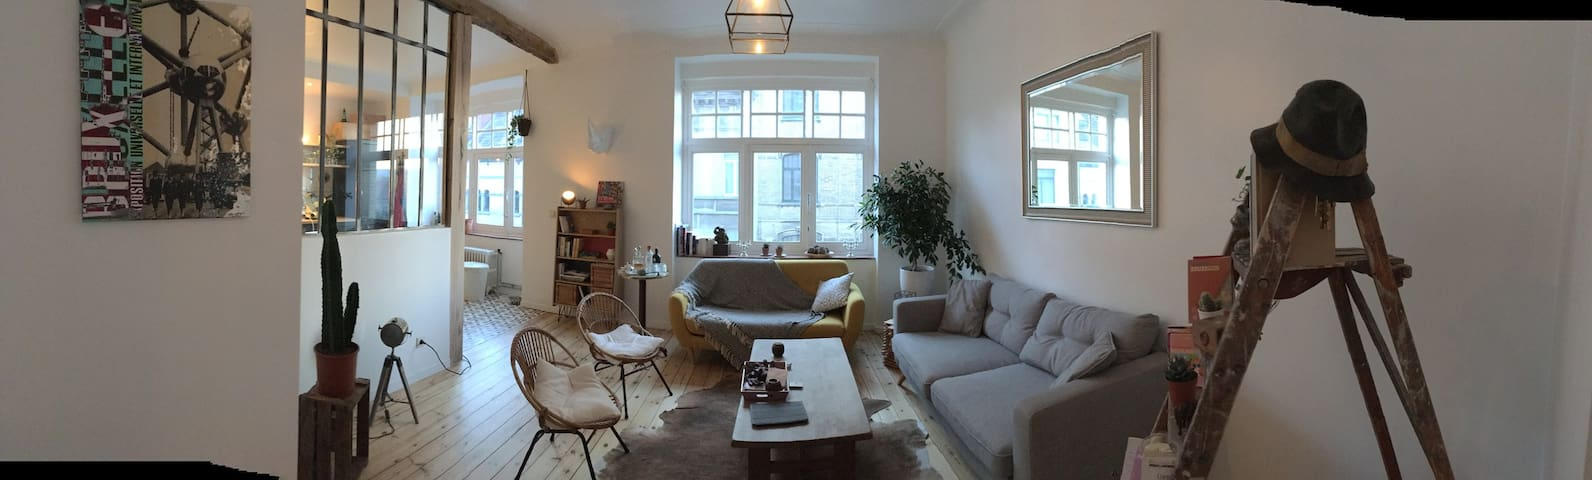 Chambre chez l'habitant - Bruxelles Schaerbeek